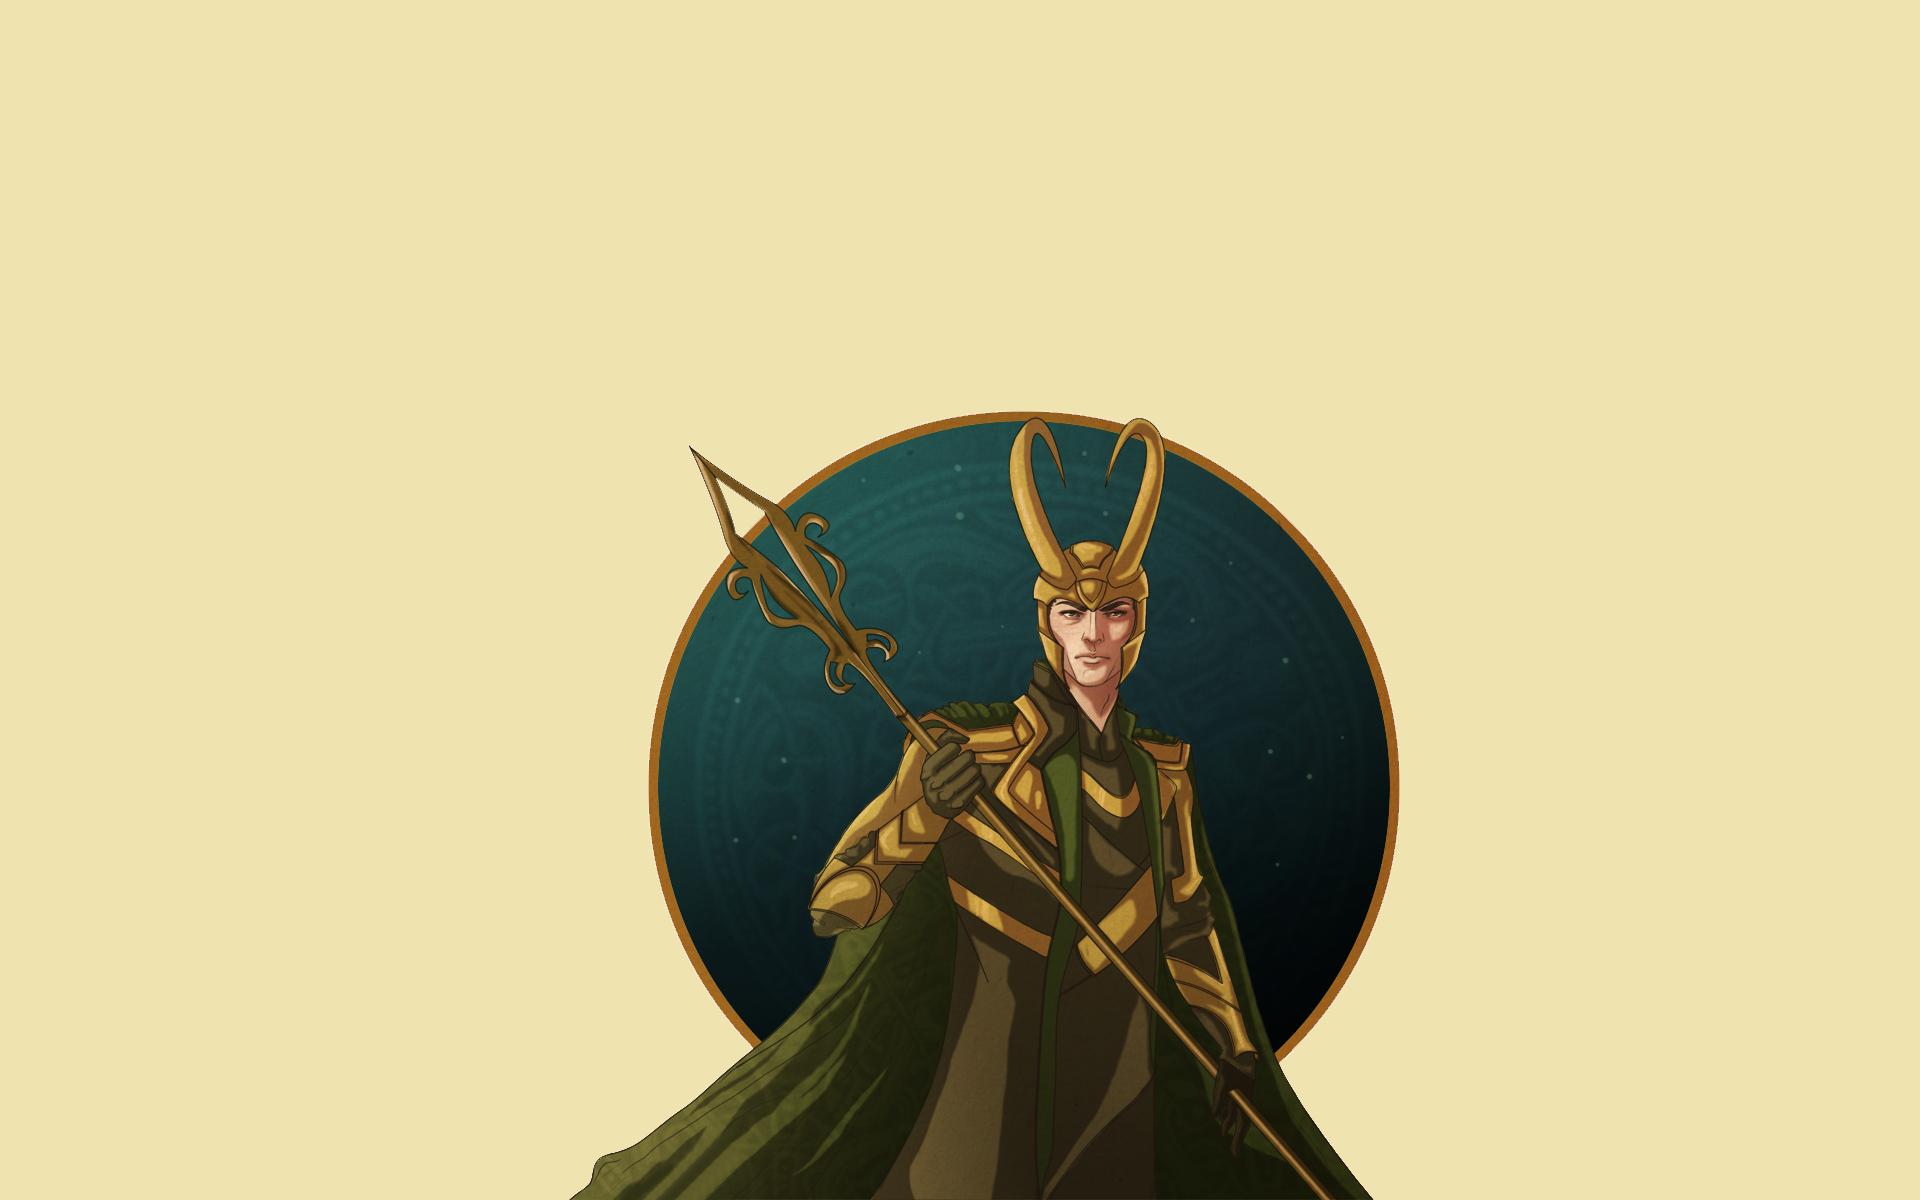 Loki wallpaper 15226 1920x1200